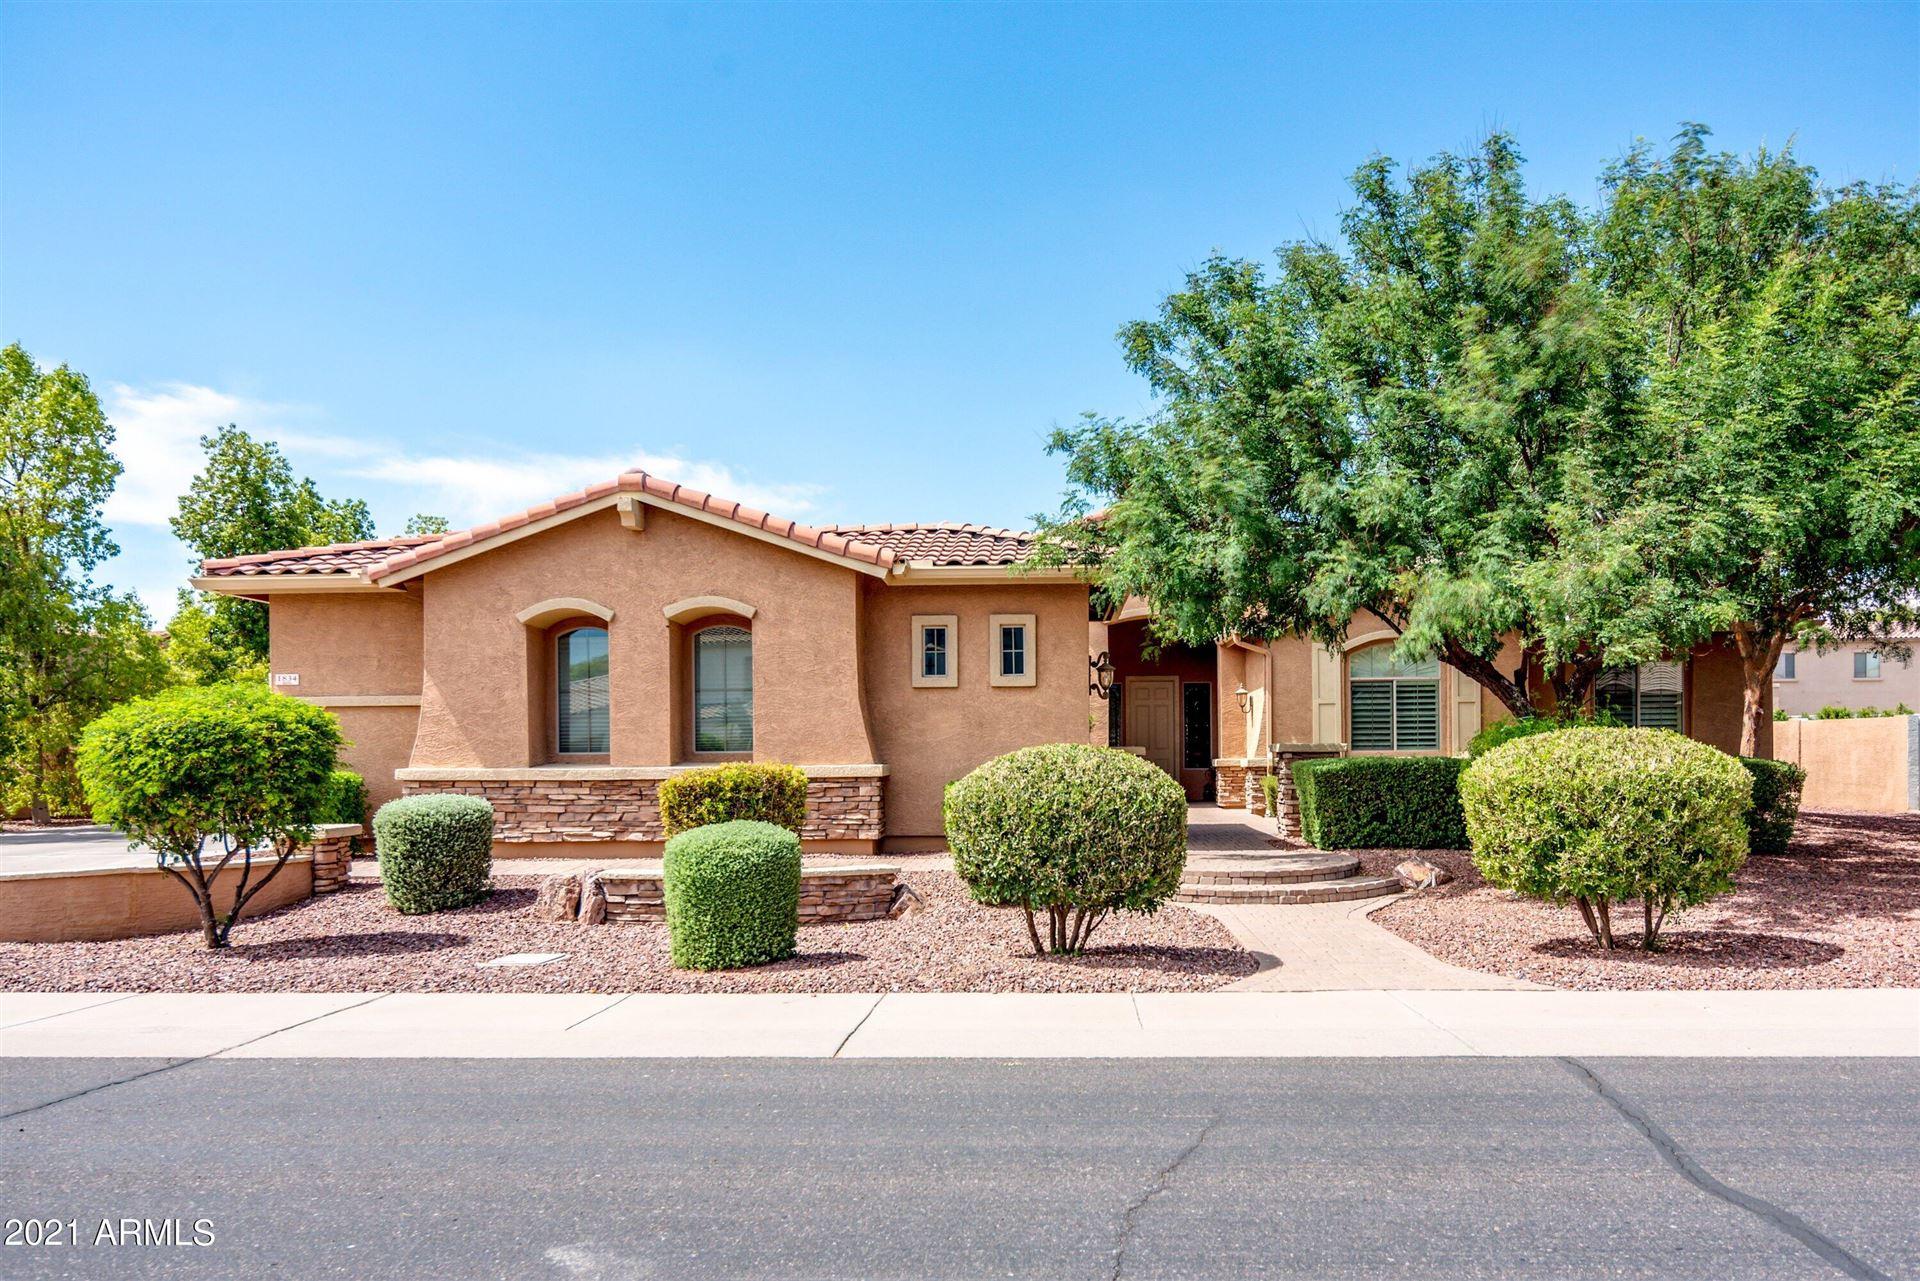 1834 E SCORPIO Place, Chandler, AZ 85249 - MLS#: 6261403